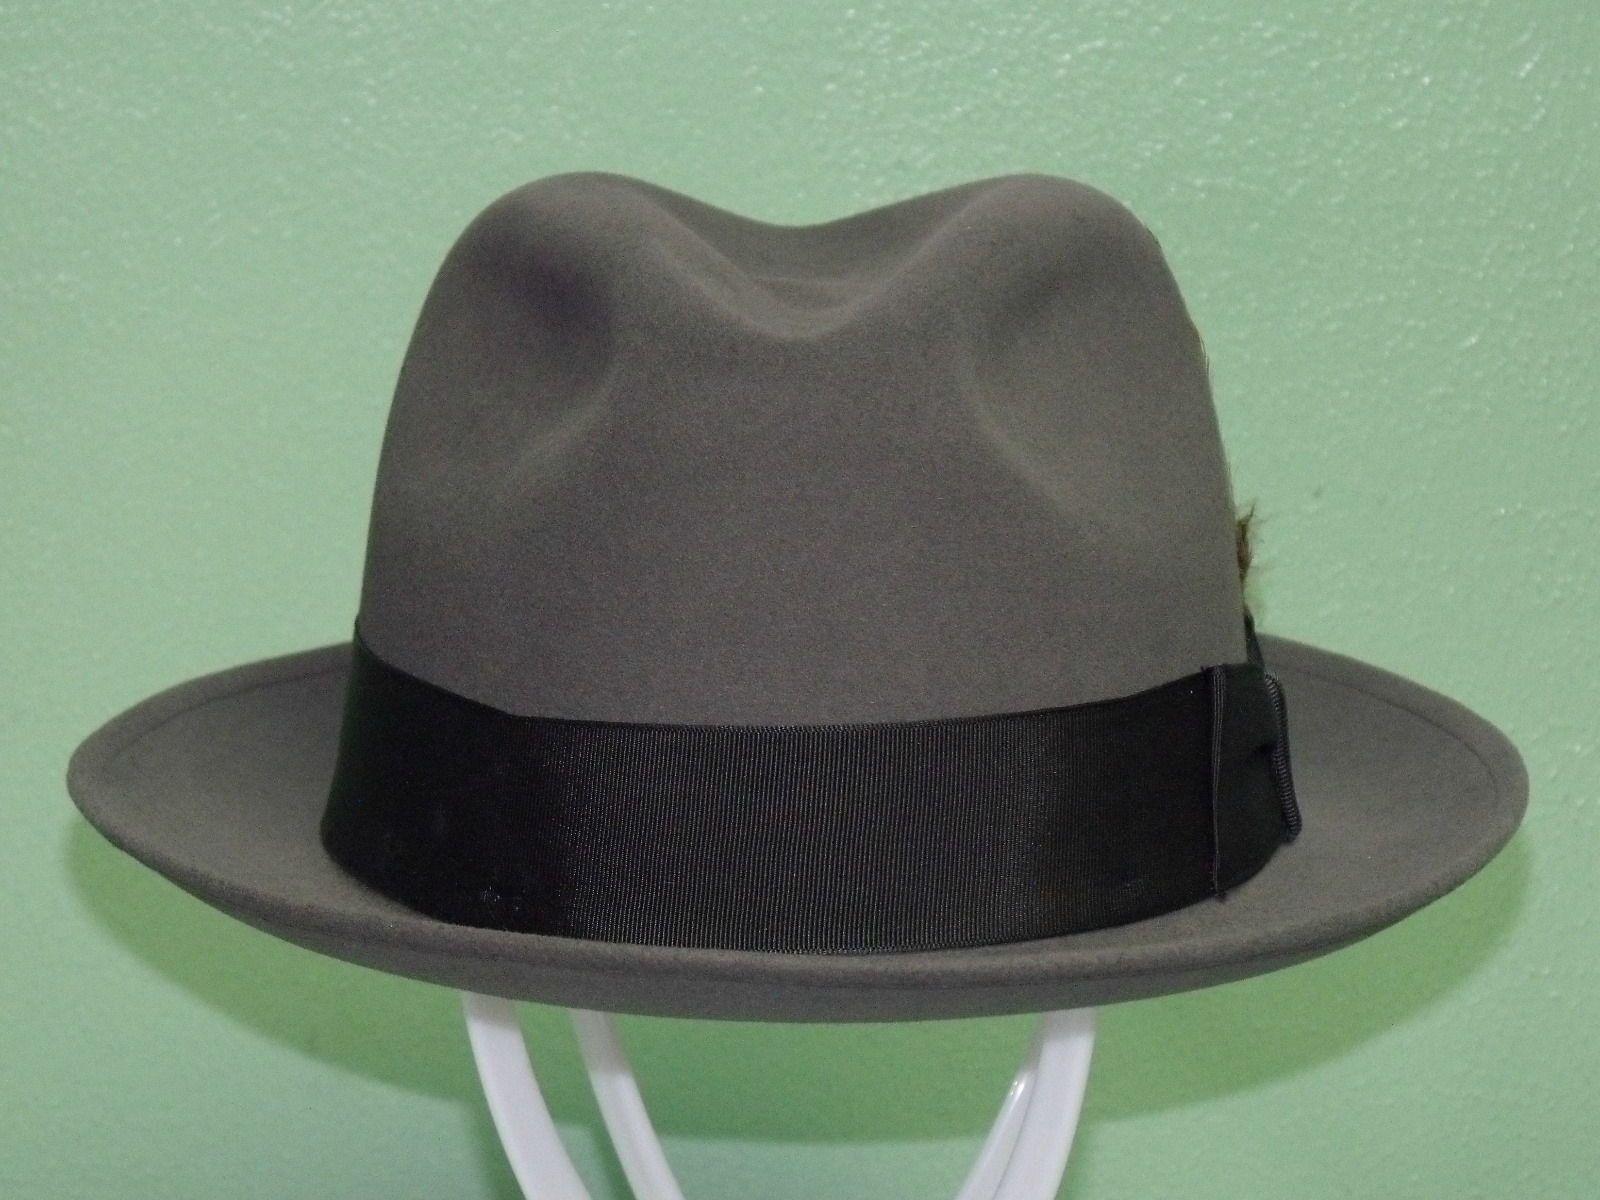 Felt Cowboy Hats Ebay c28b802e86d0